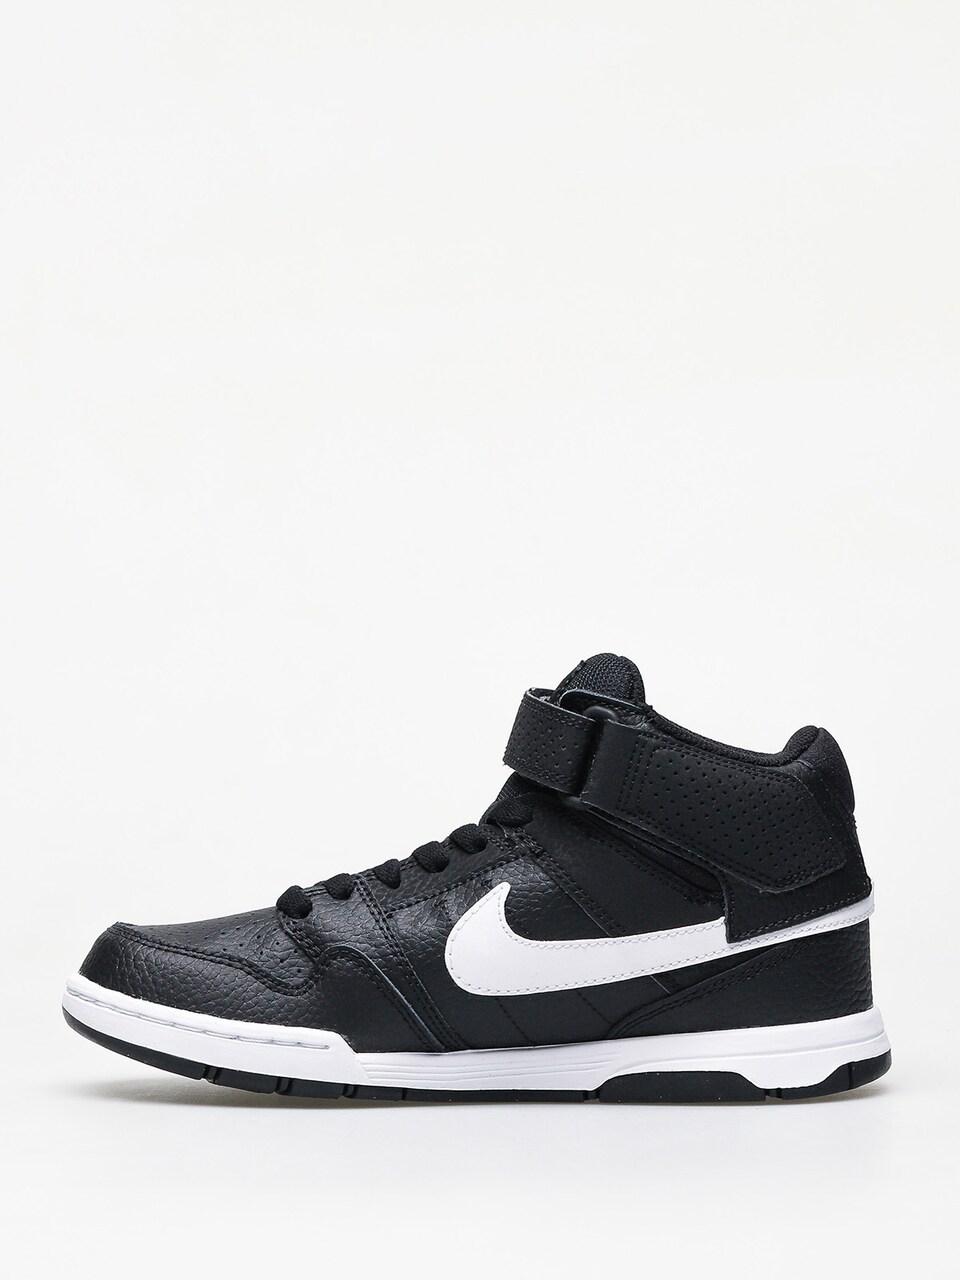 Oscuro Oral Adjunto archivo  Nike SB Mogan Mid 2 Jr Gs Shoes (black/white)